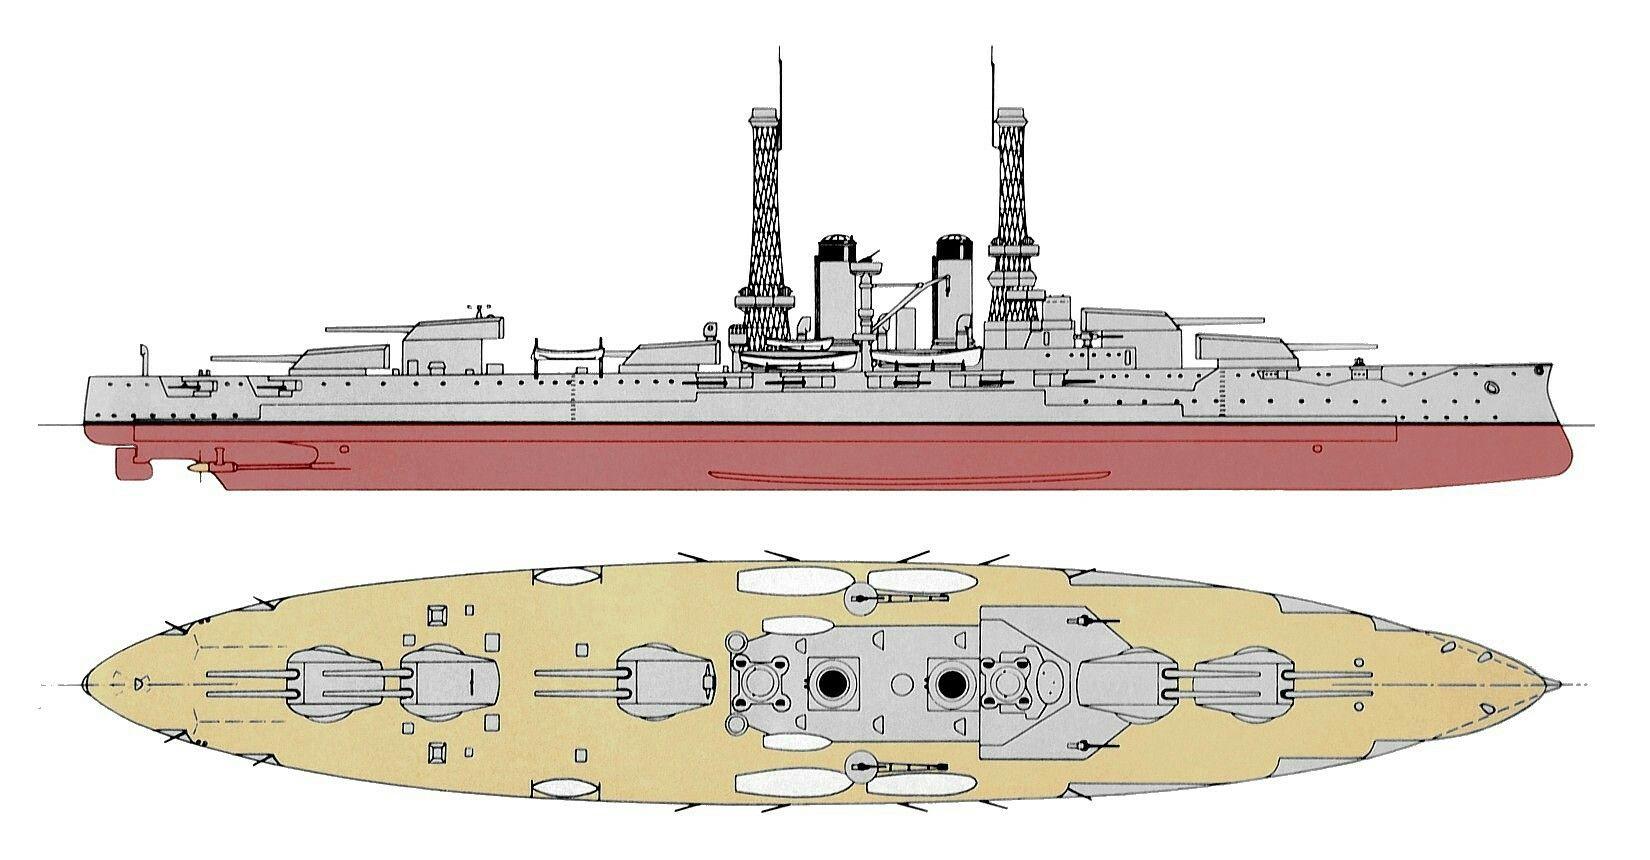 medium resolution of uss new york new york class battleship battleship battleship uss new york diagram